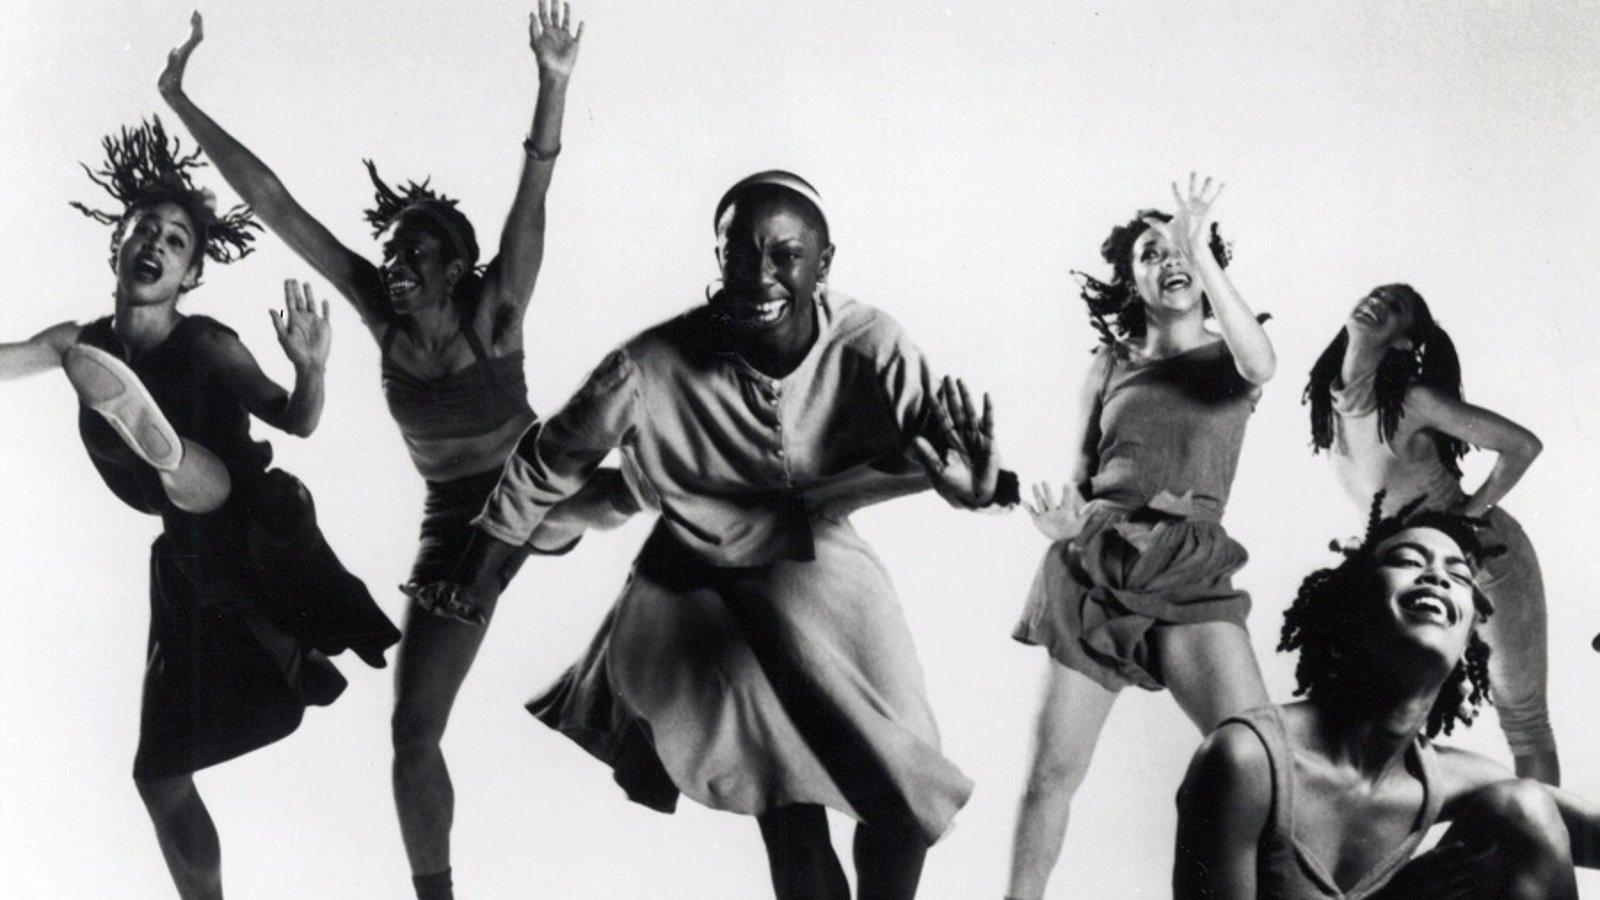 Women's Work - An African American Dance Company